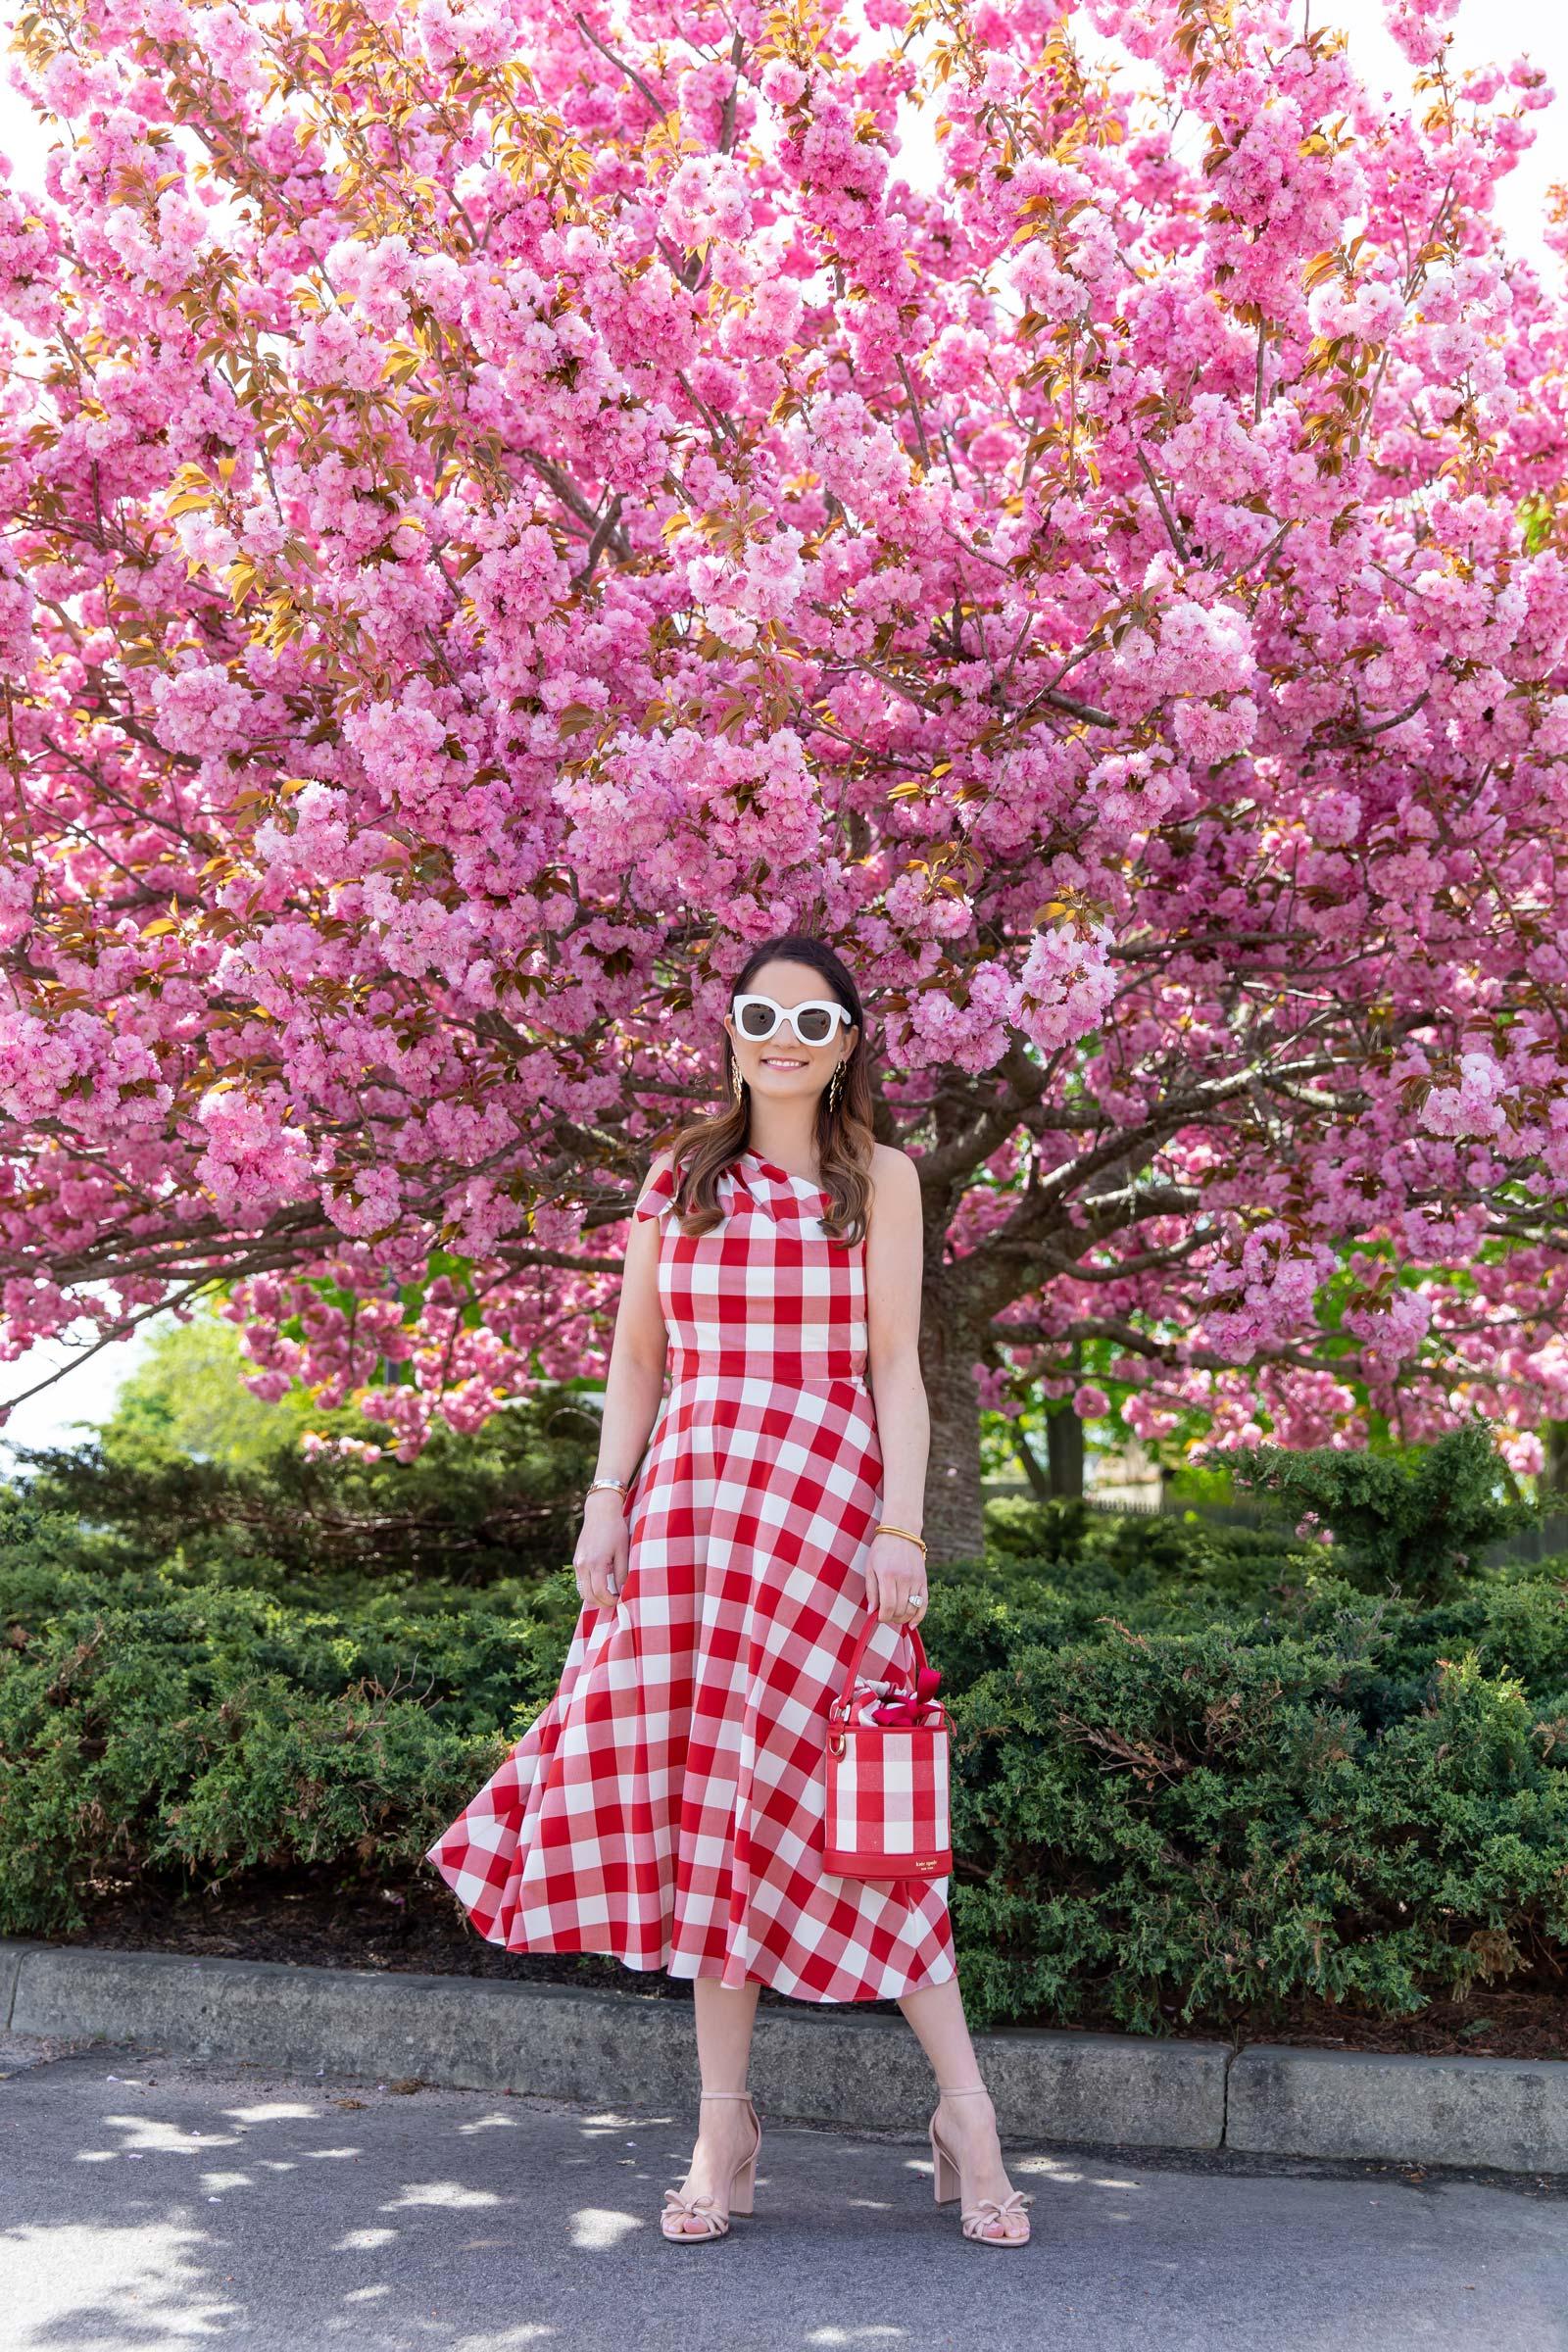 Rhode Island Pink Trees